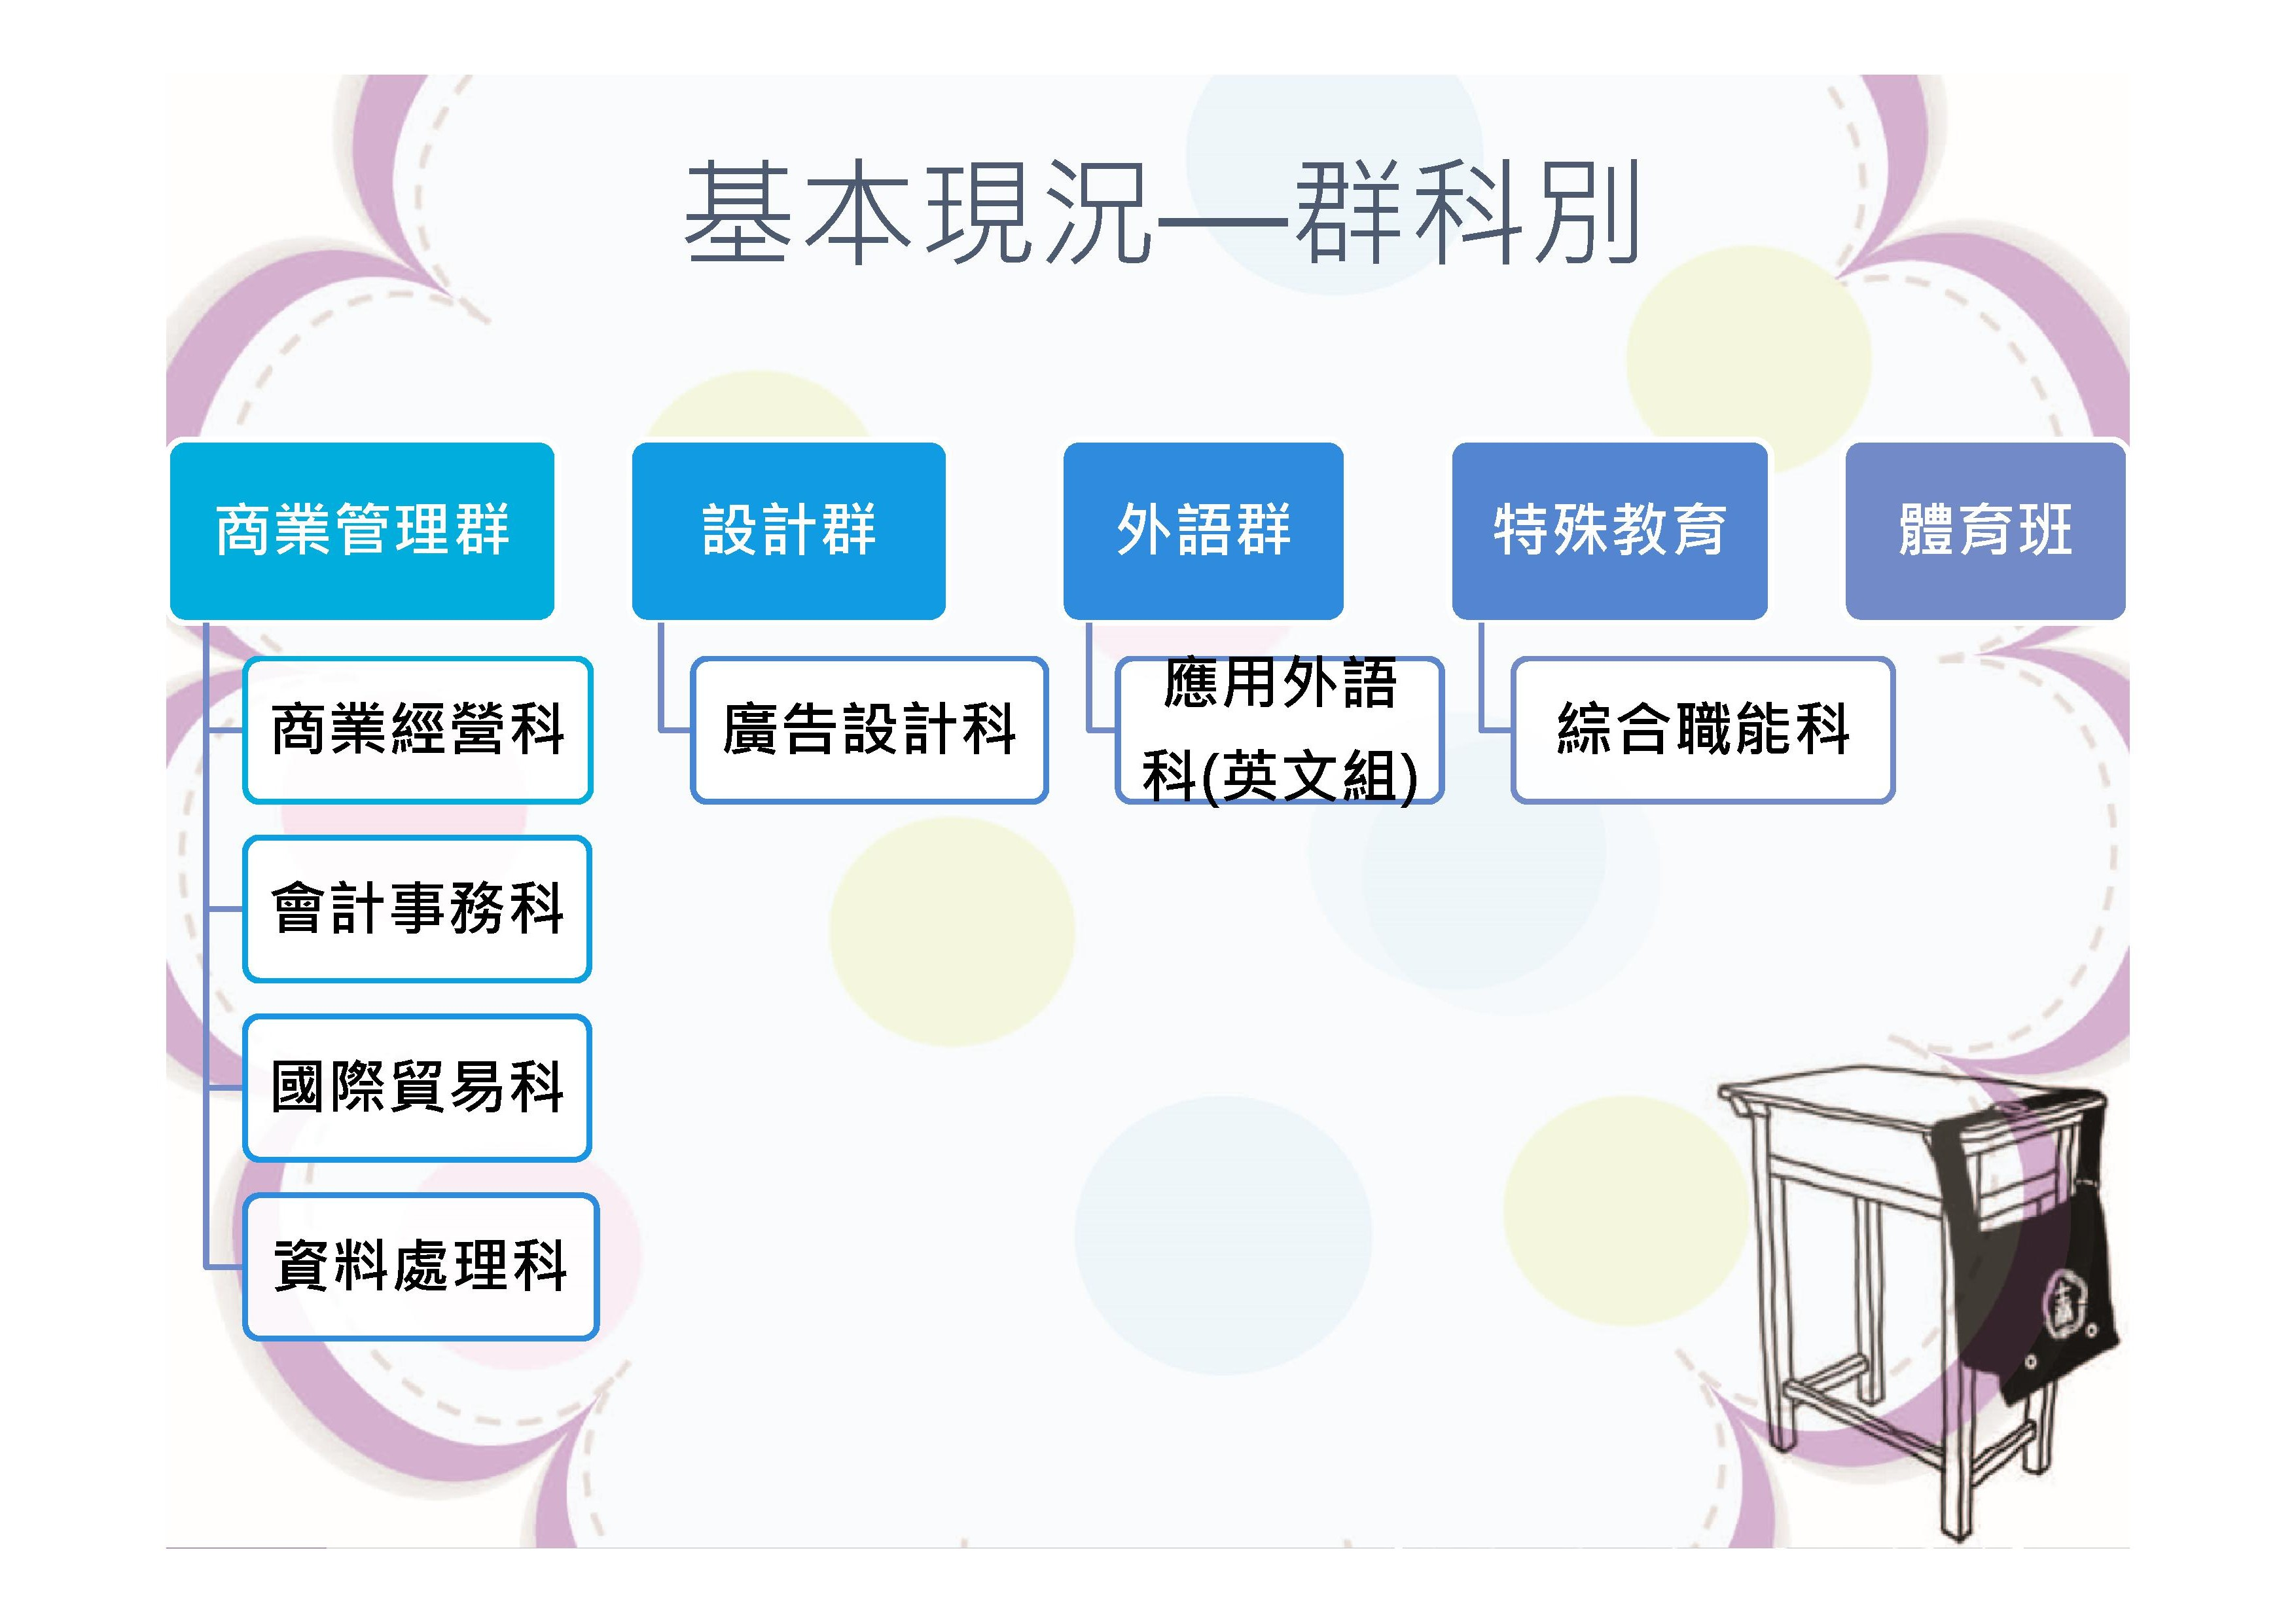 Microsoft PowerPoint - 技職教育暨士商簡介.pptx00010